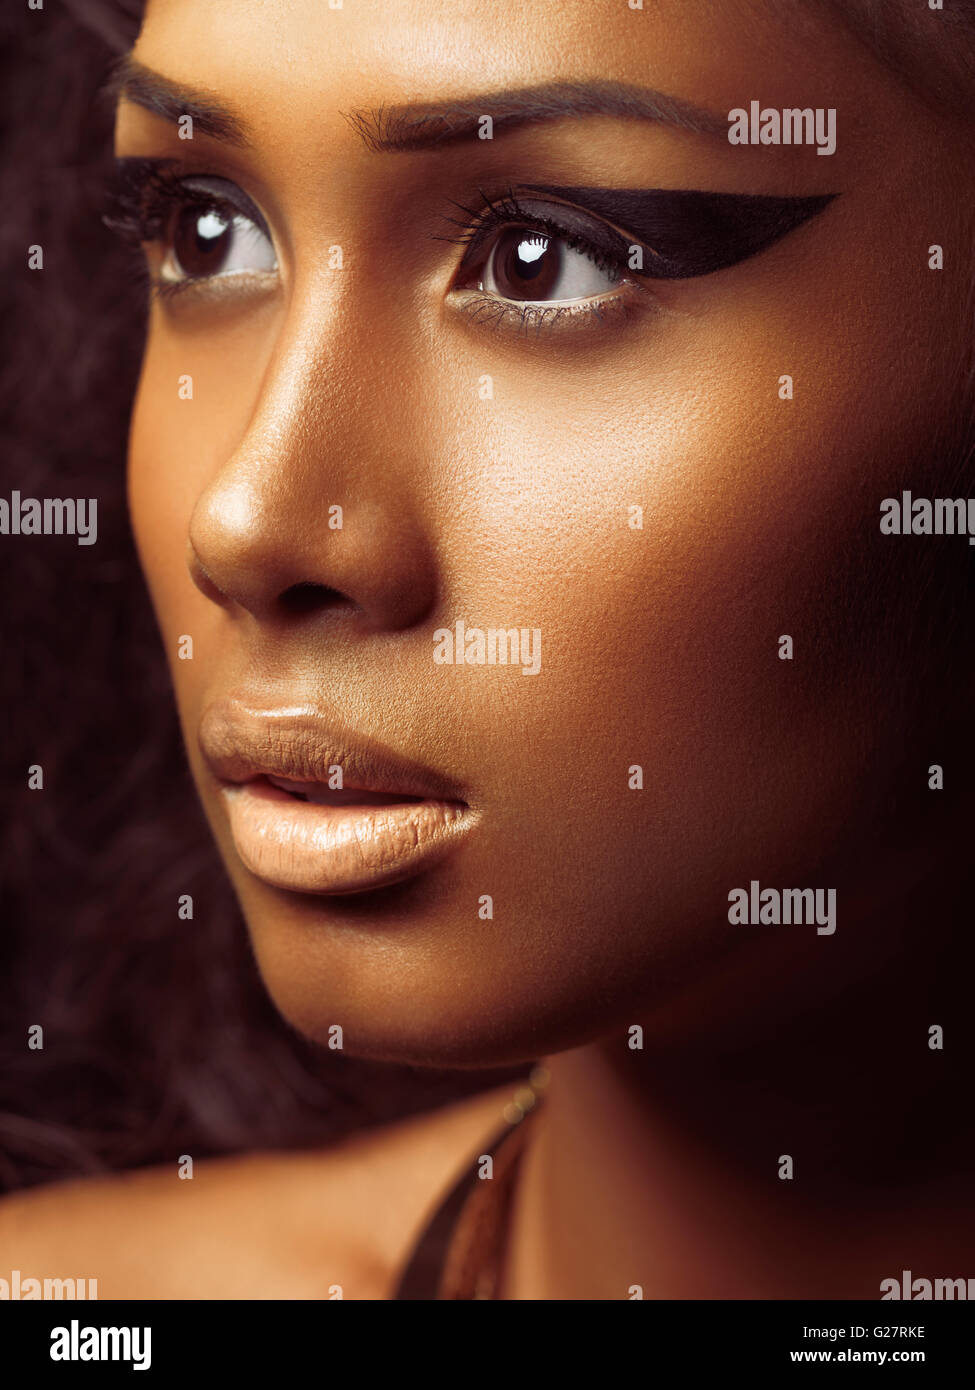 Woman wearing edgy makeup, golden skin